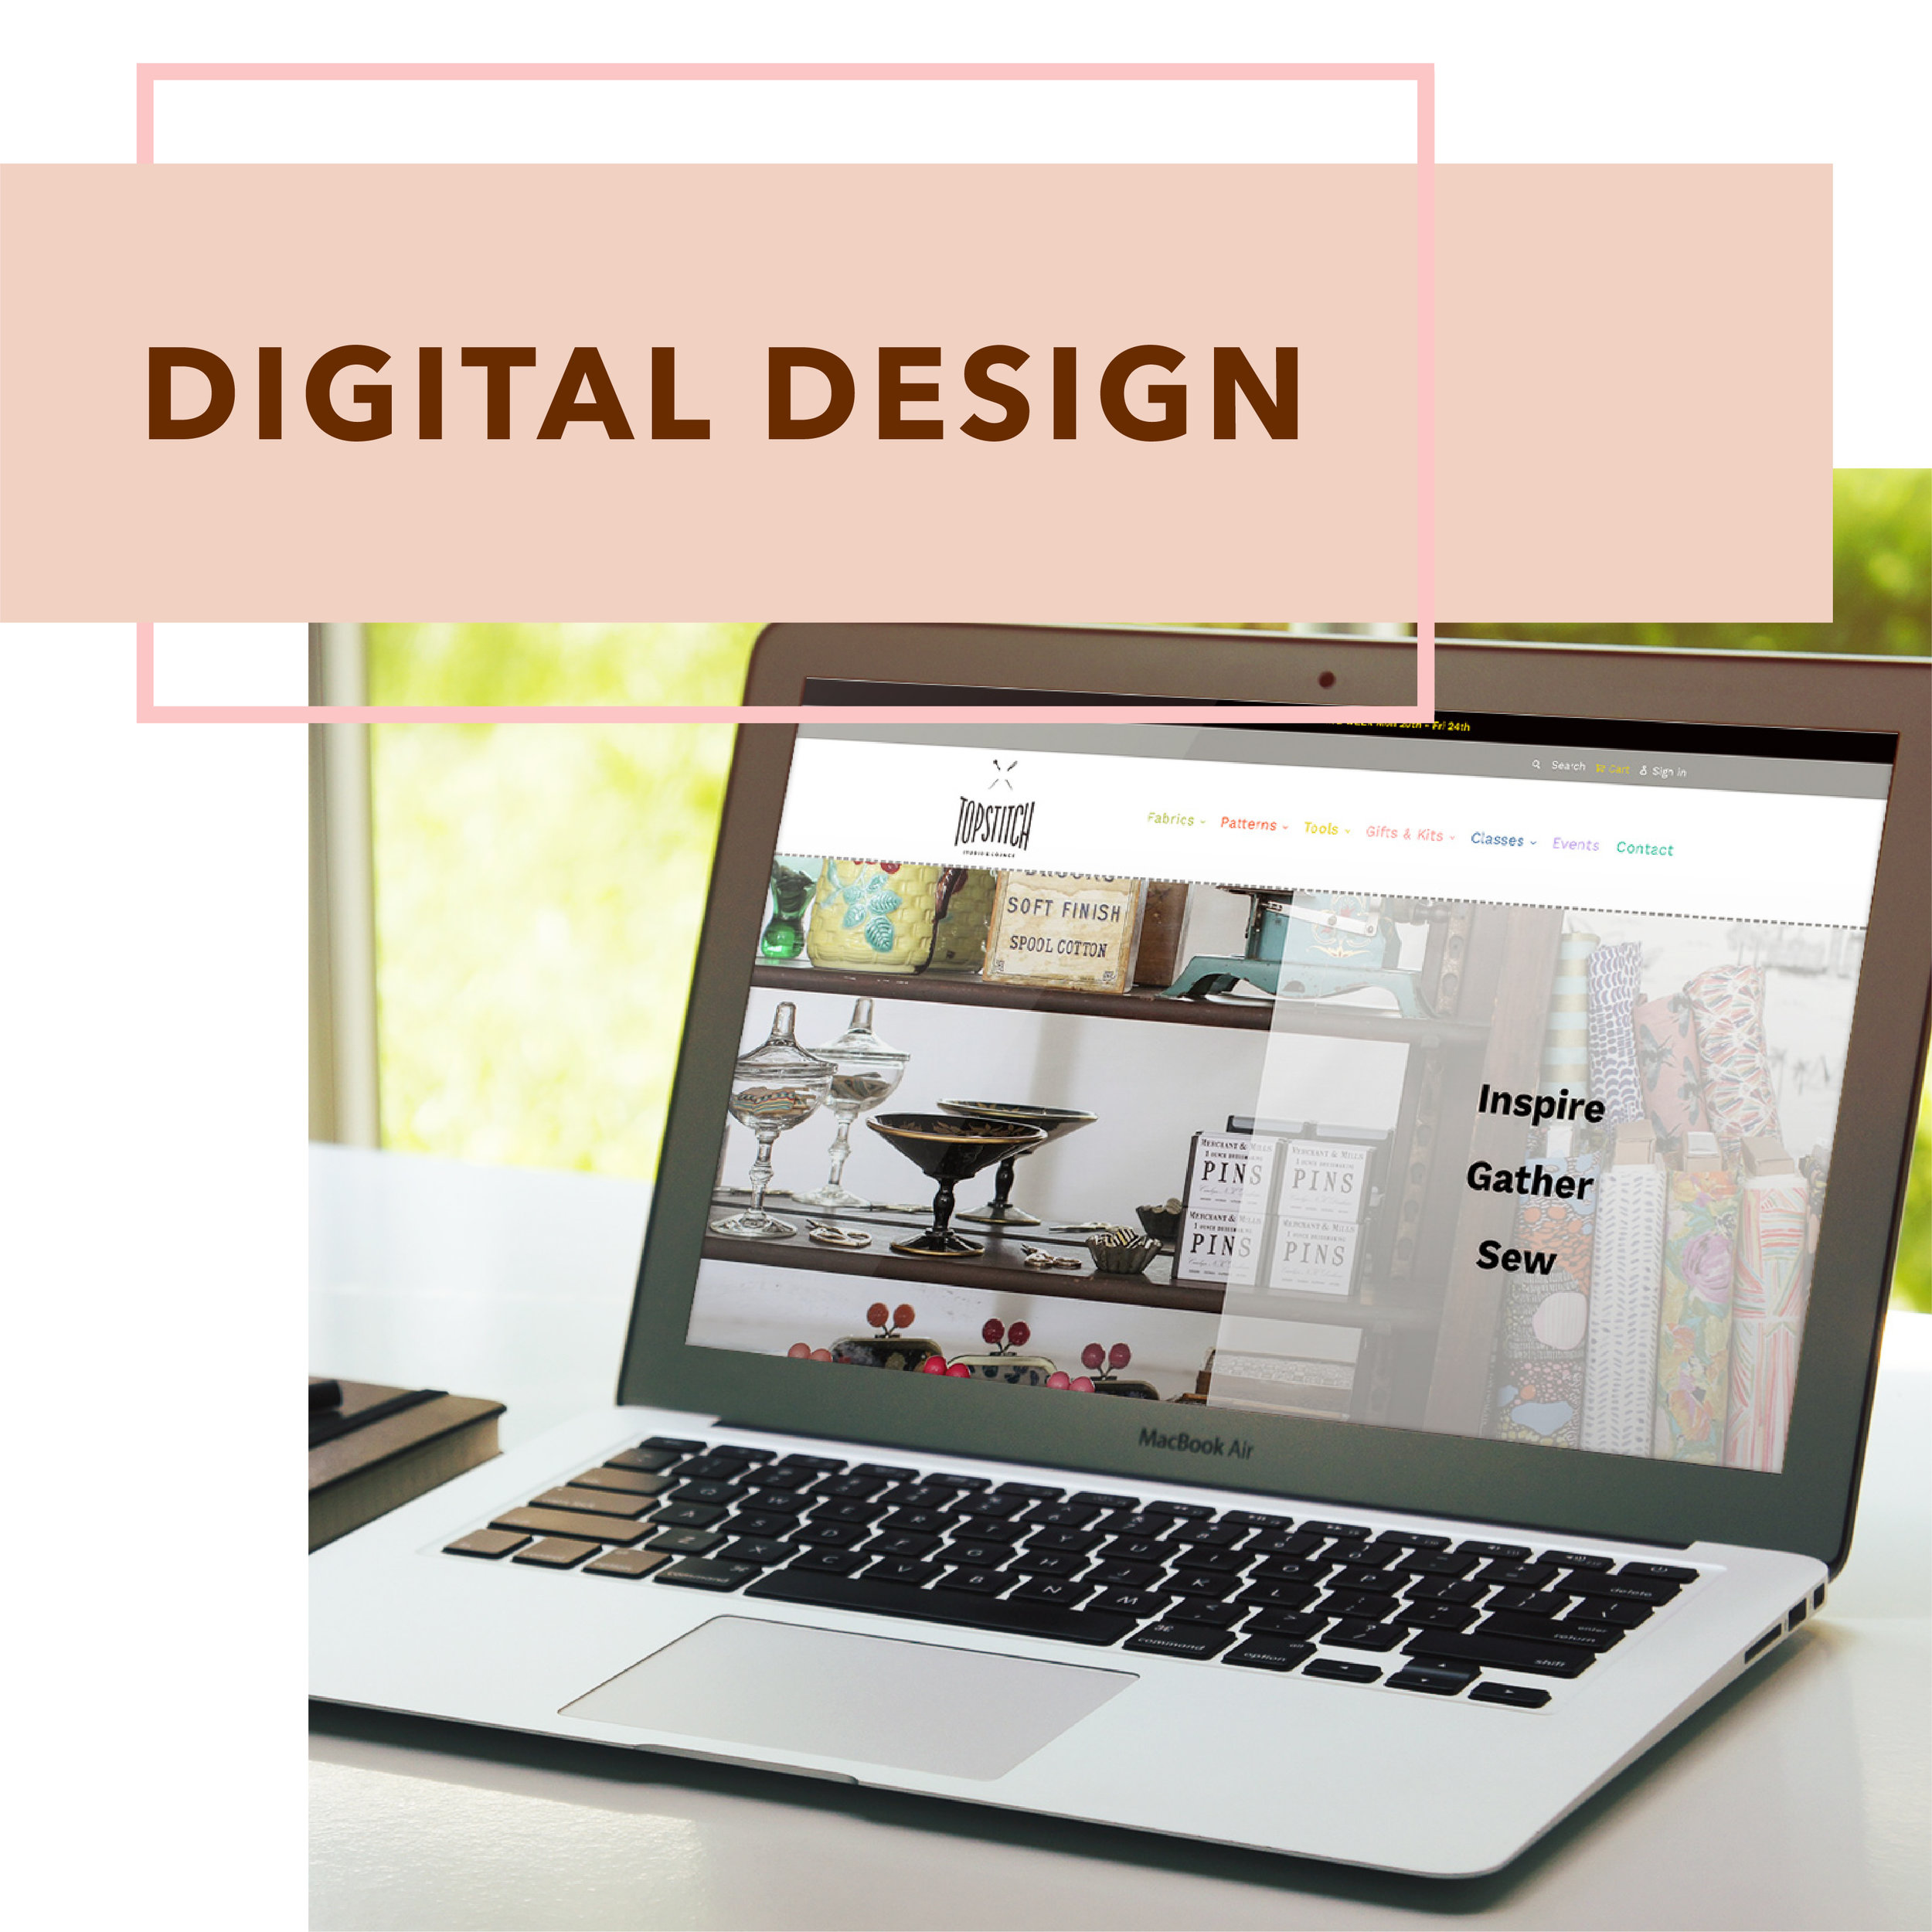 Digital Design 3.jpg